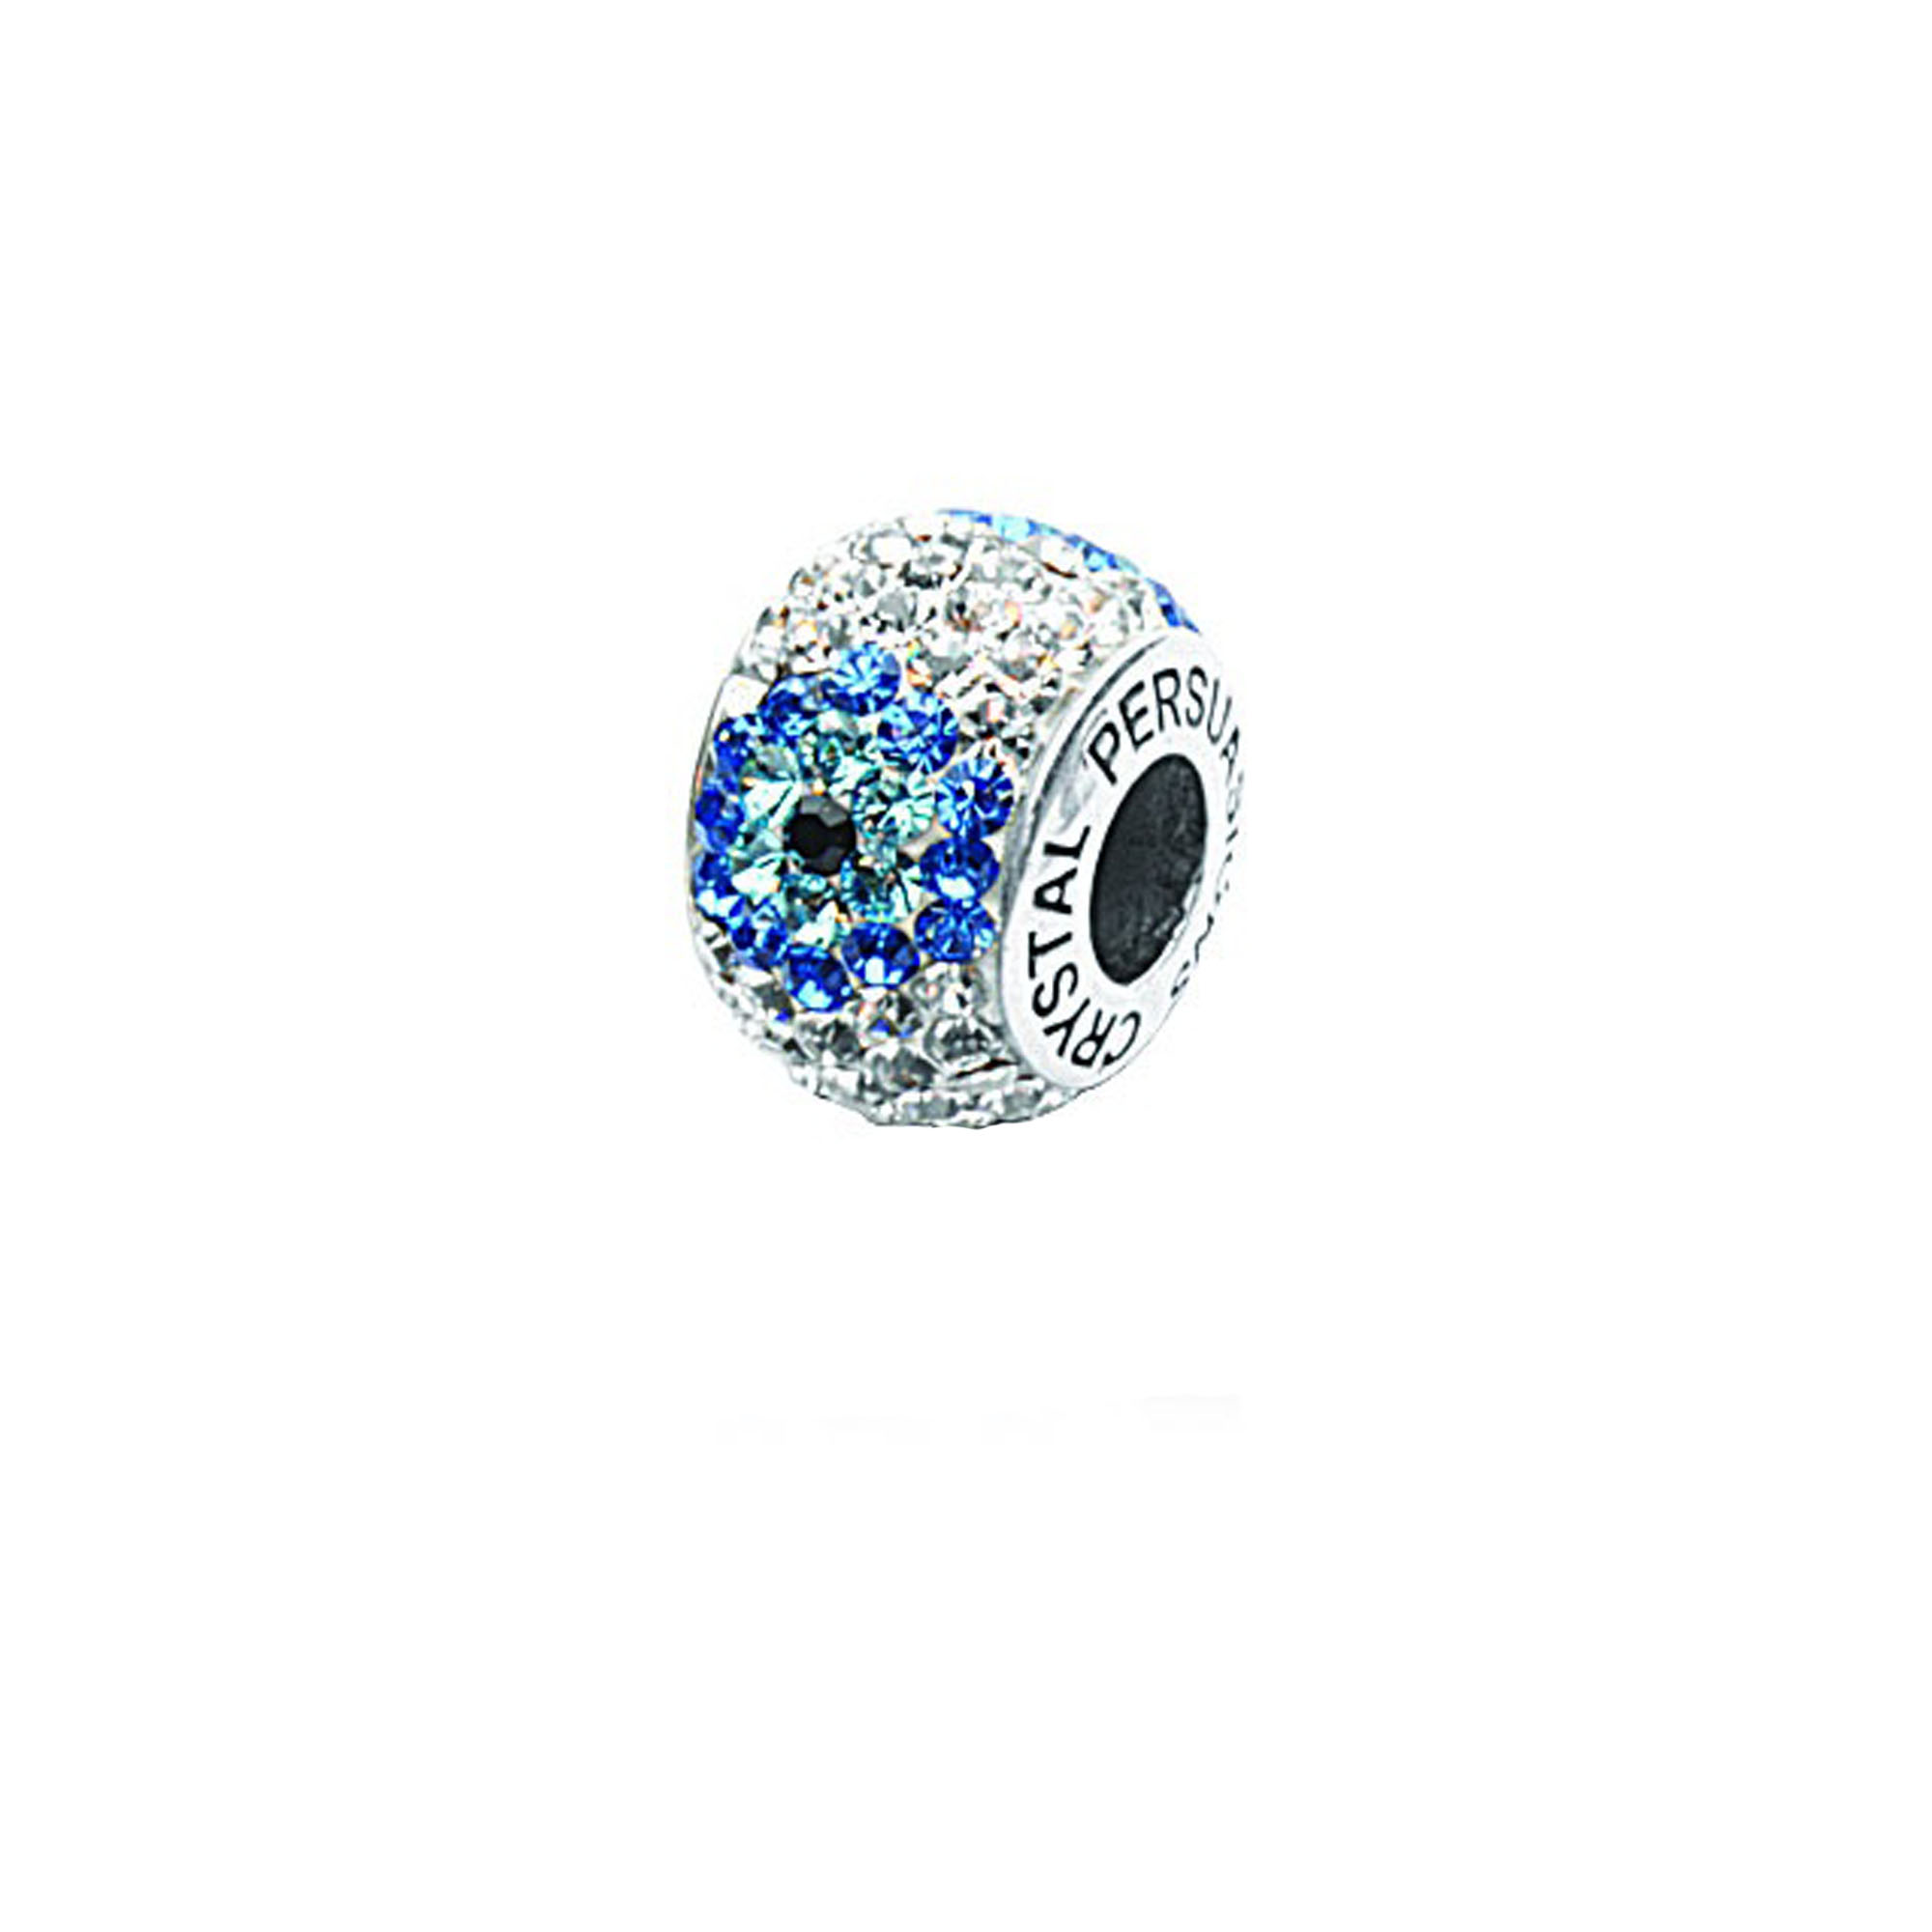 Silver Pendant, Flower Blue/ White Cyrstal Bead